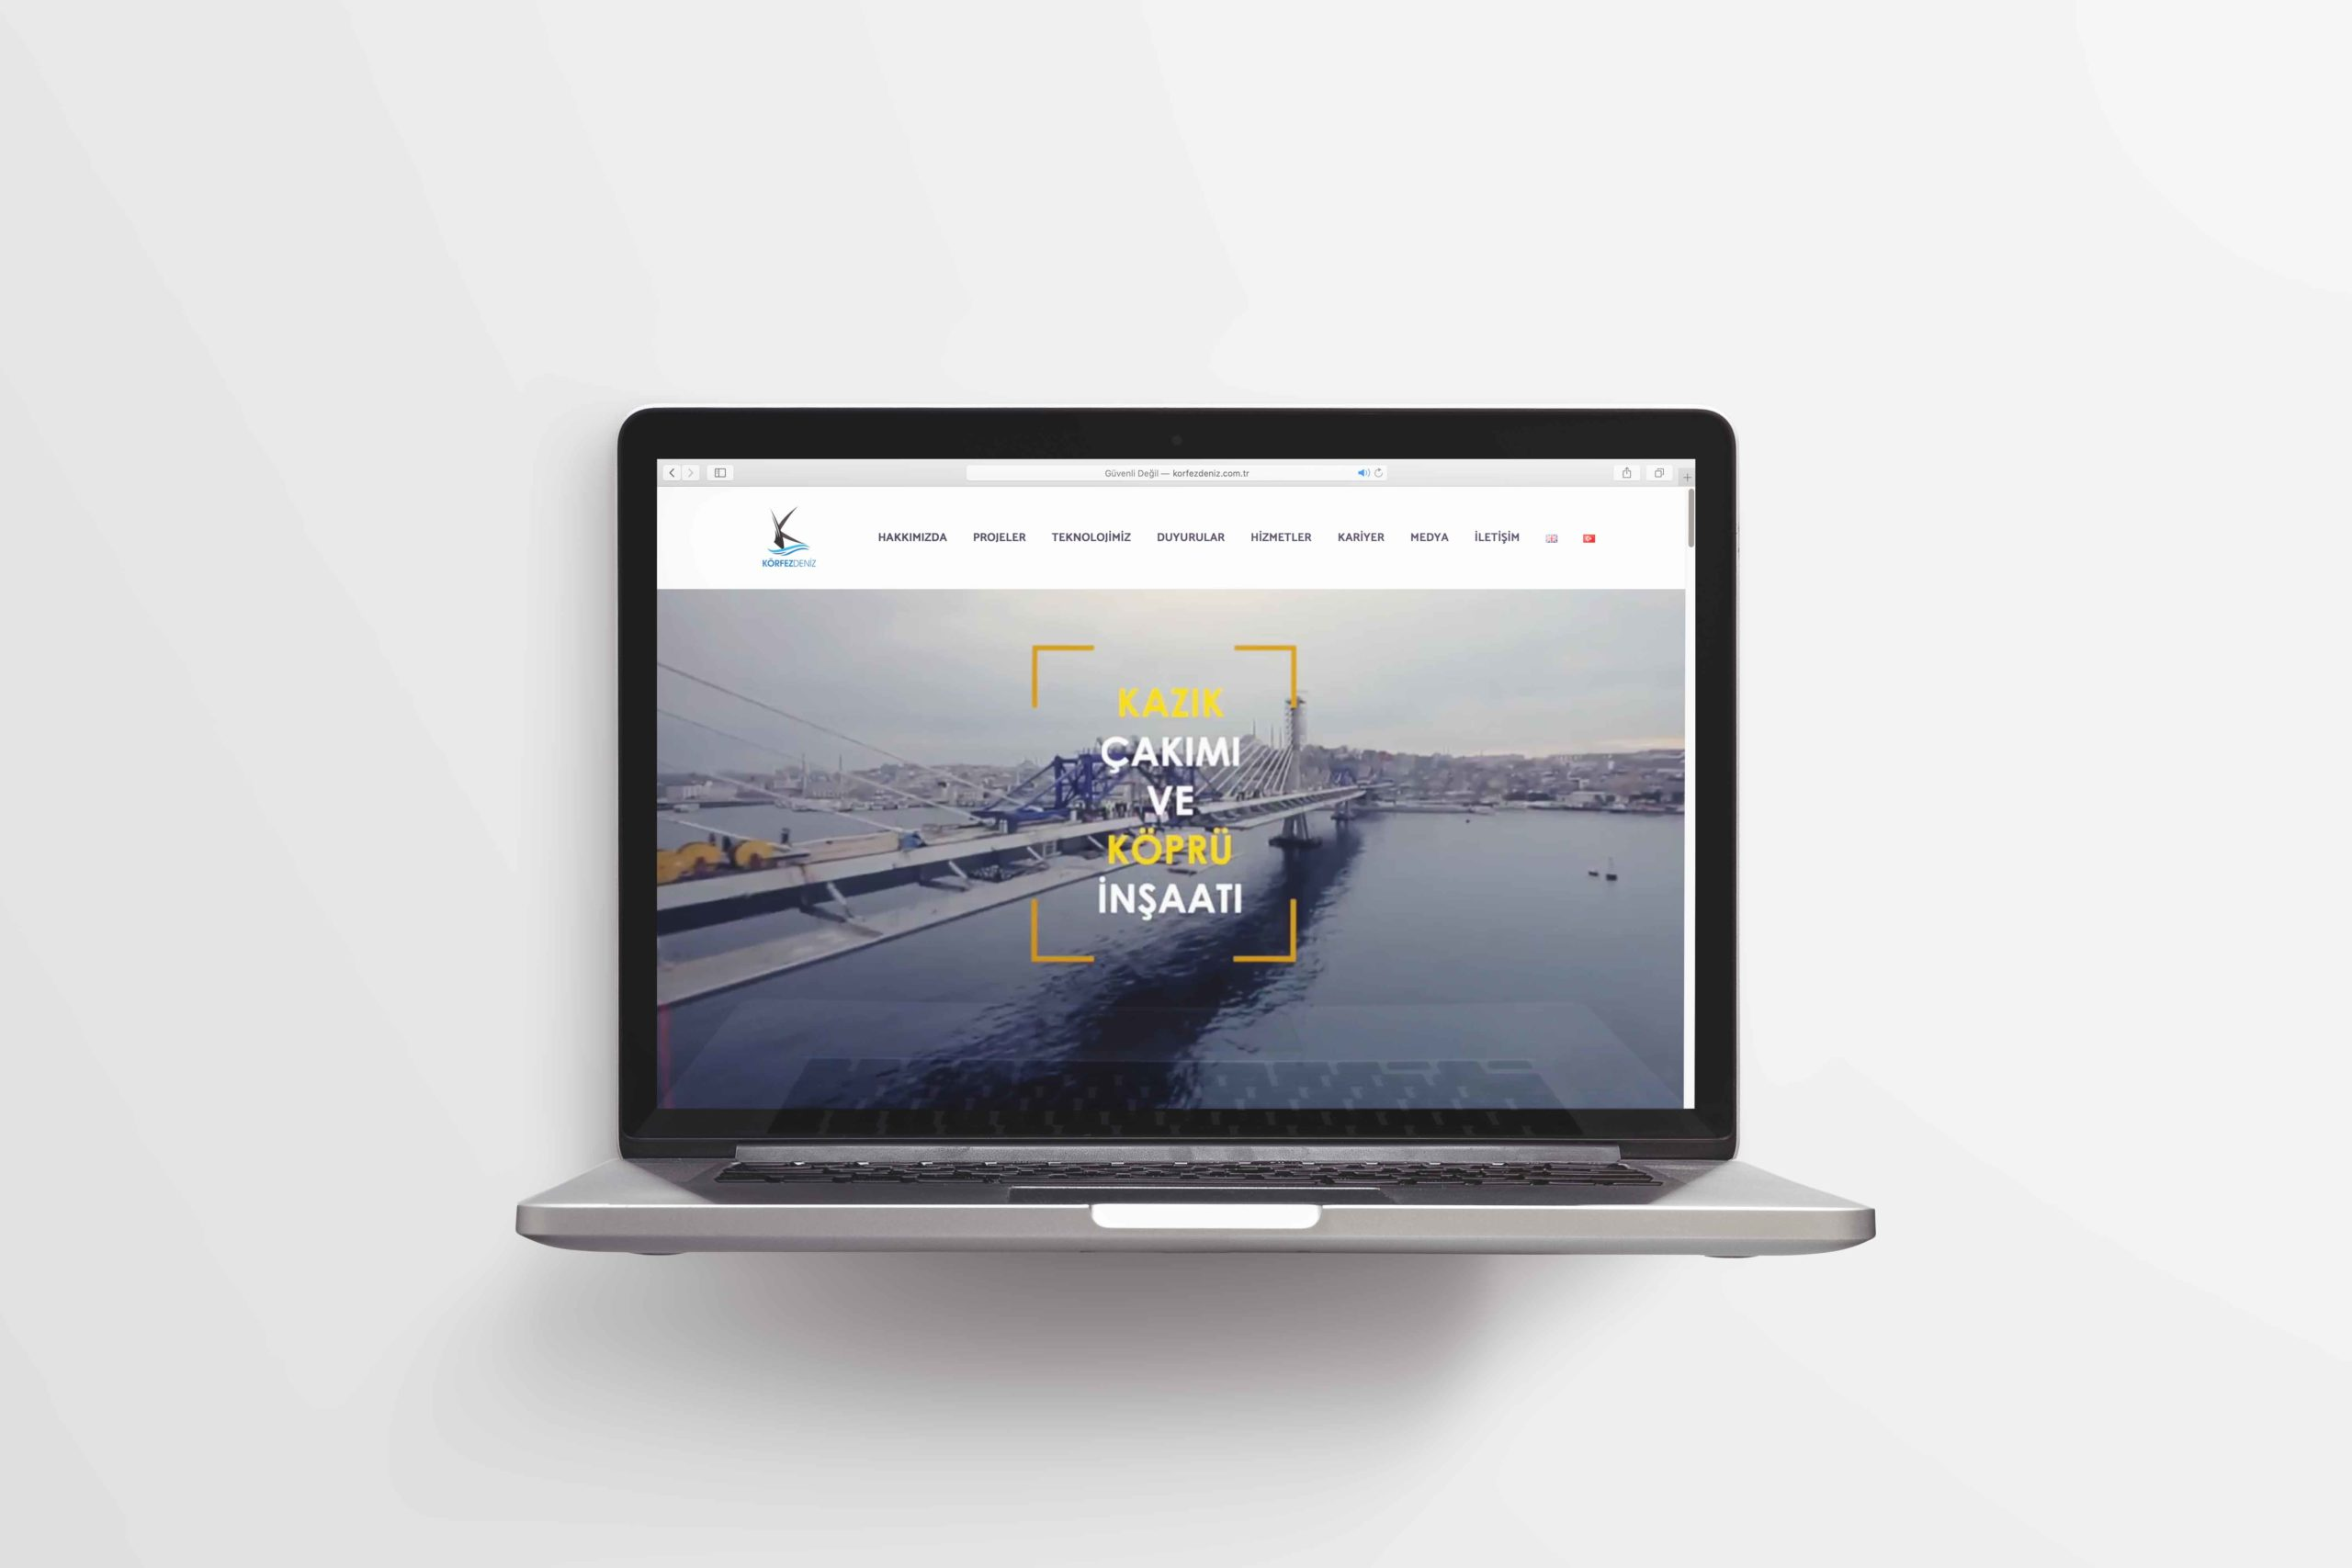 https://rdmedya.com/wp-content/uploads/2020/04/korfez-deniz-insaat-web-tasarim-scaled.jpg